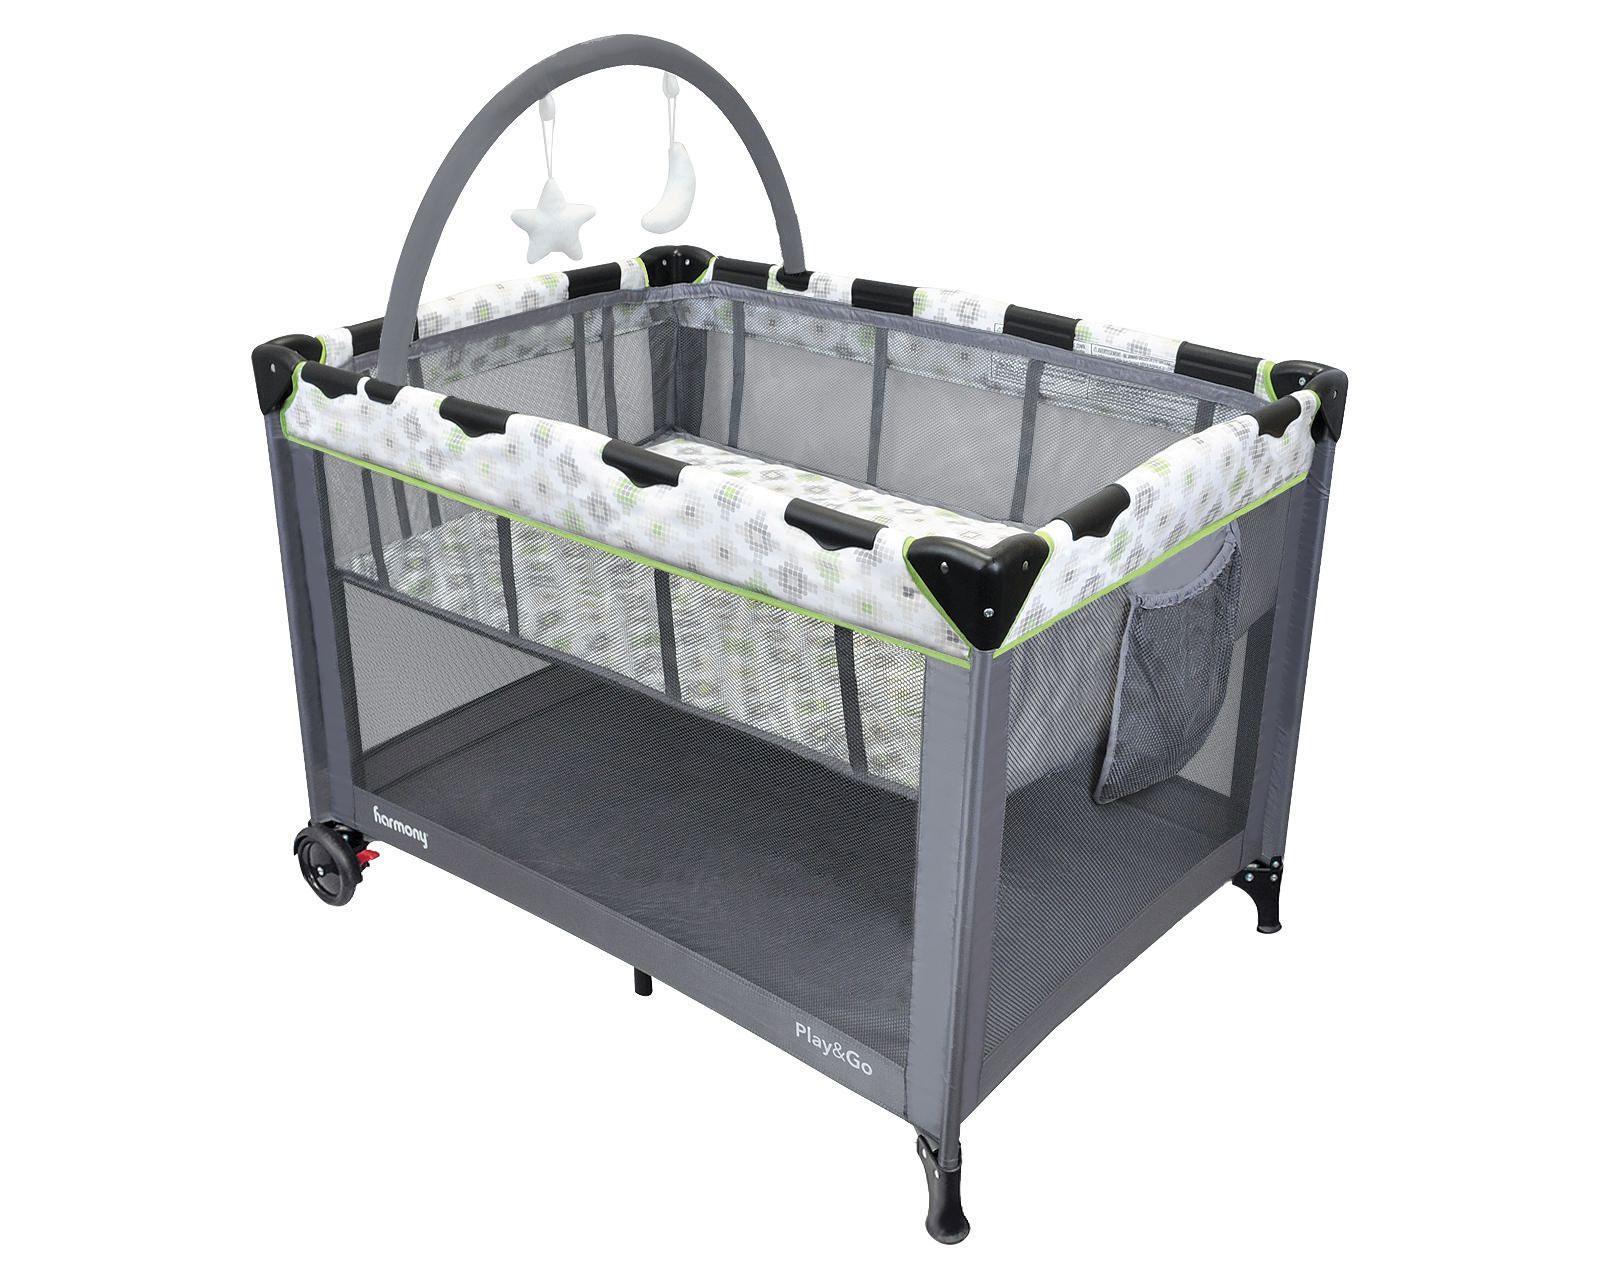 Walmart.ca:Harmony双层游戏床/婴儿床只卖$49.97